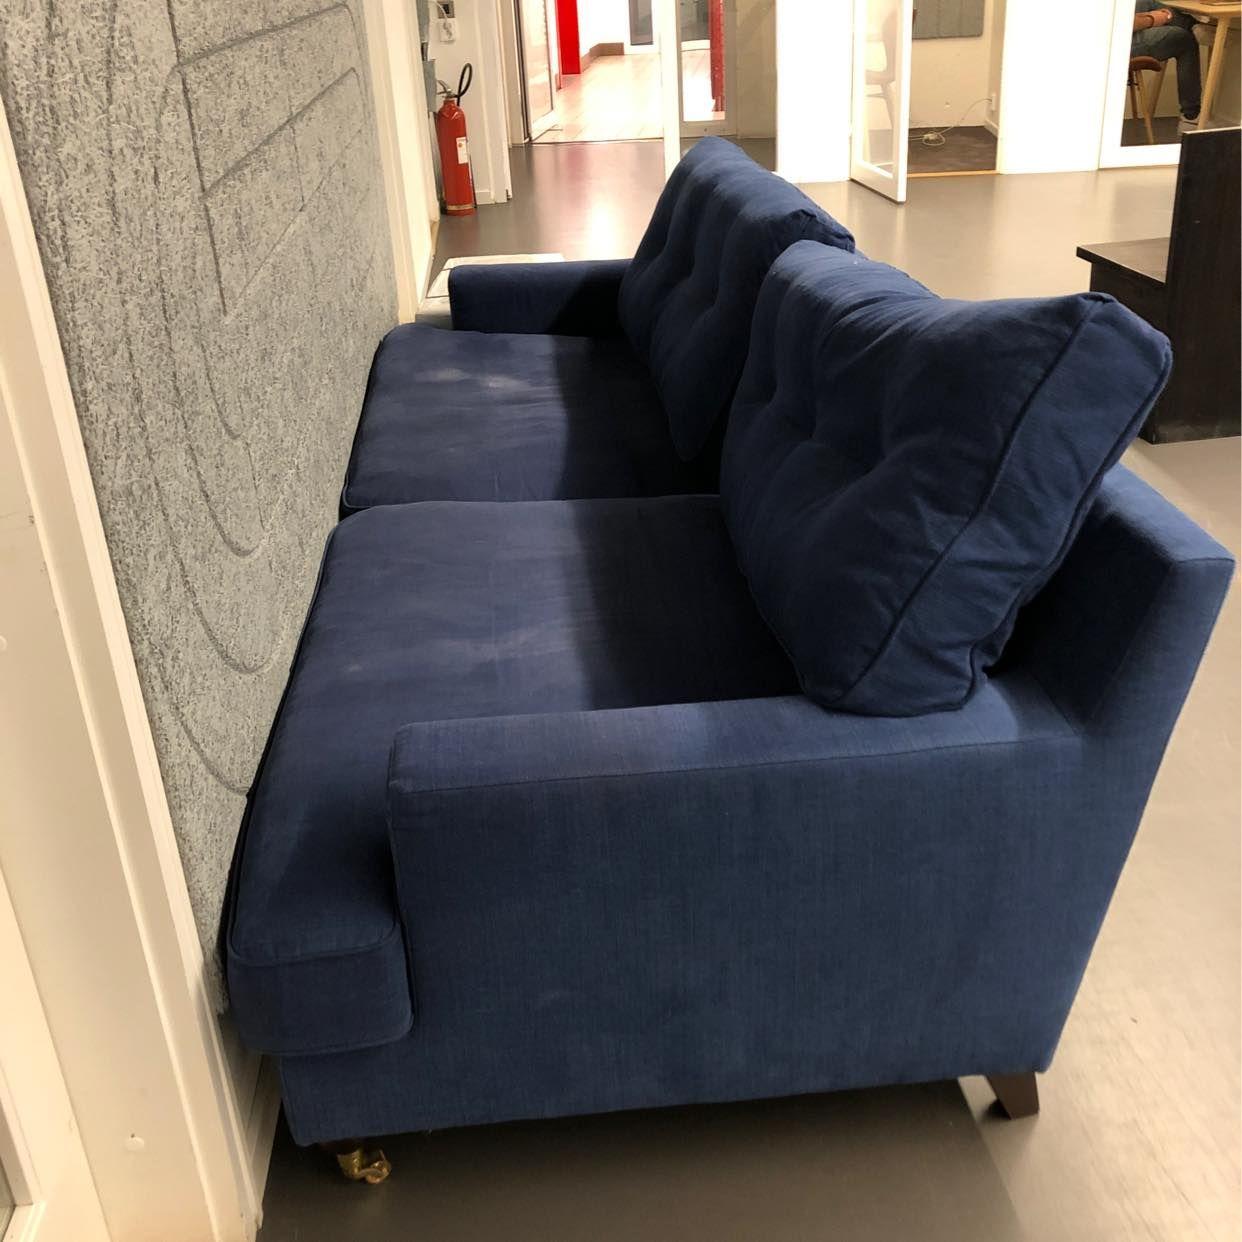 image of Throw furniture - Stockholm